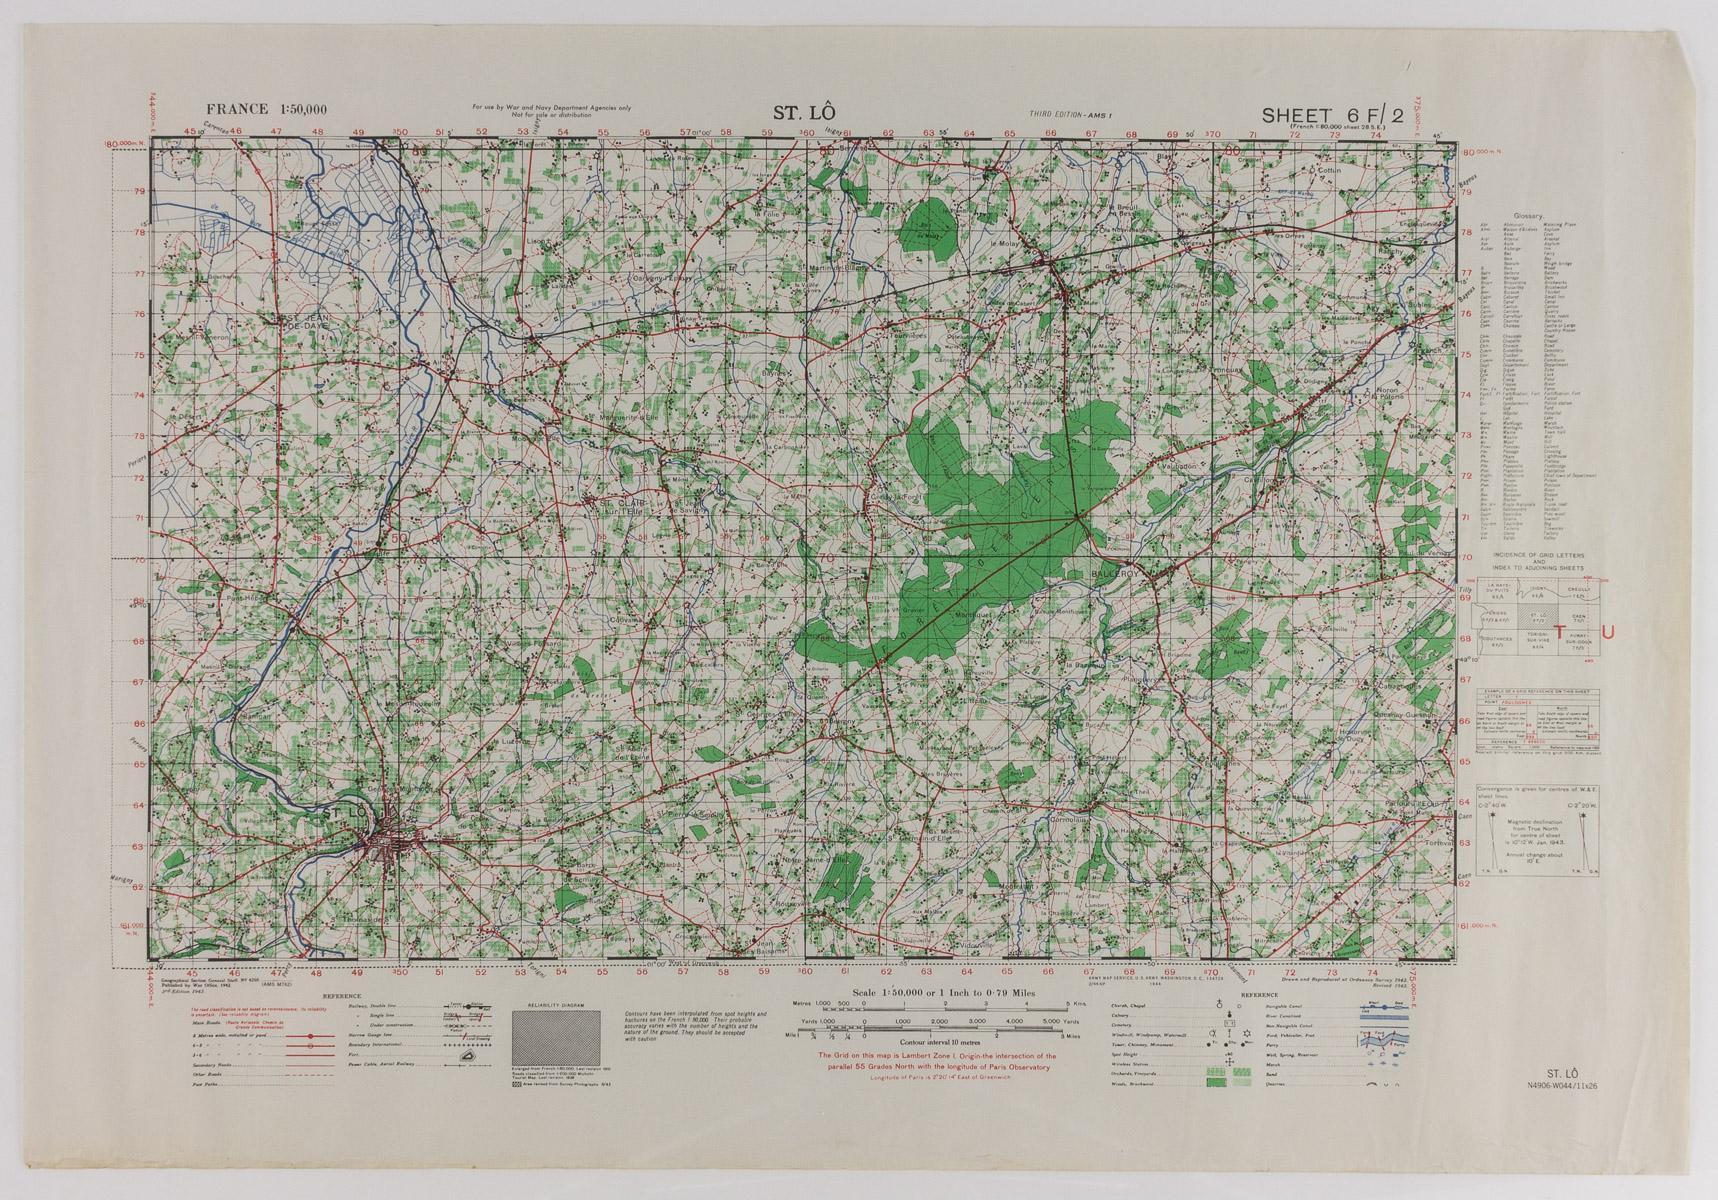 GEN. CLARENCE R. HUEBNER'S MAP OF ST. LO